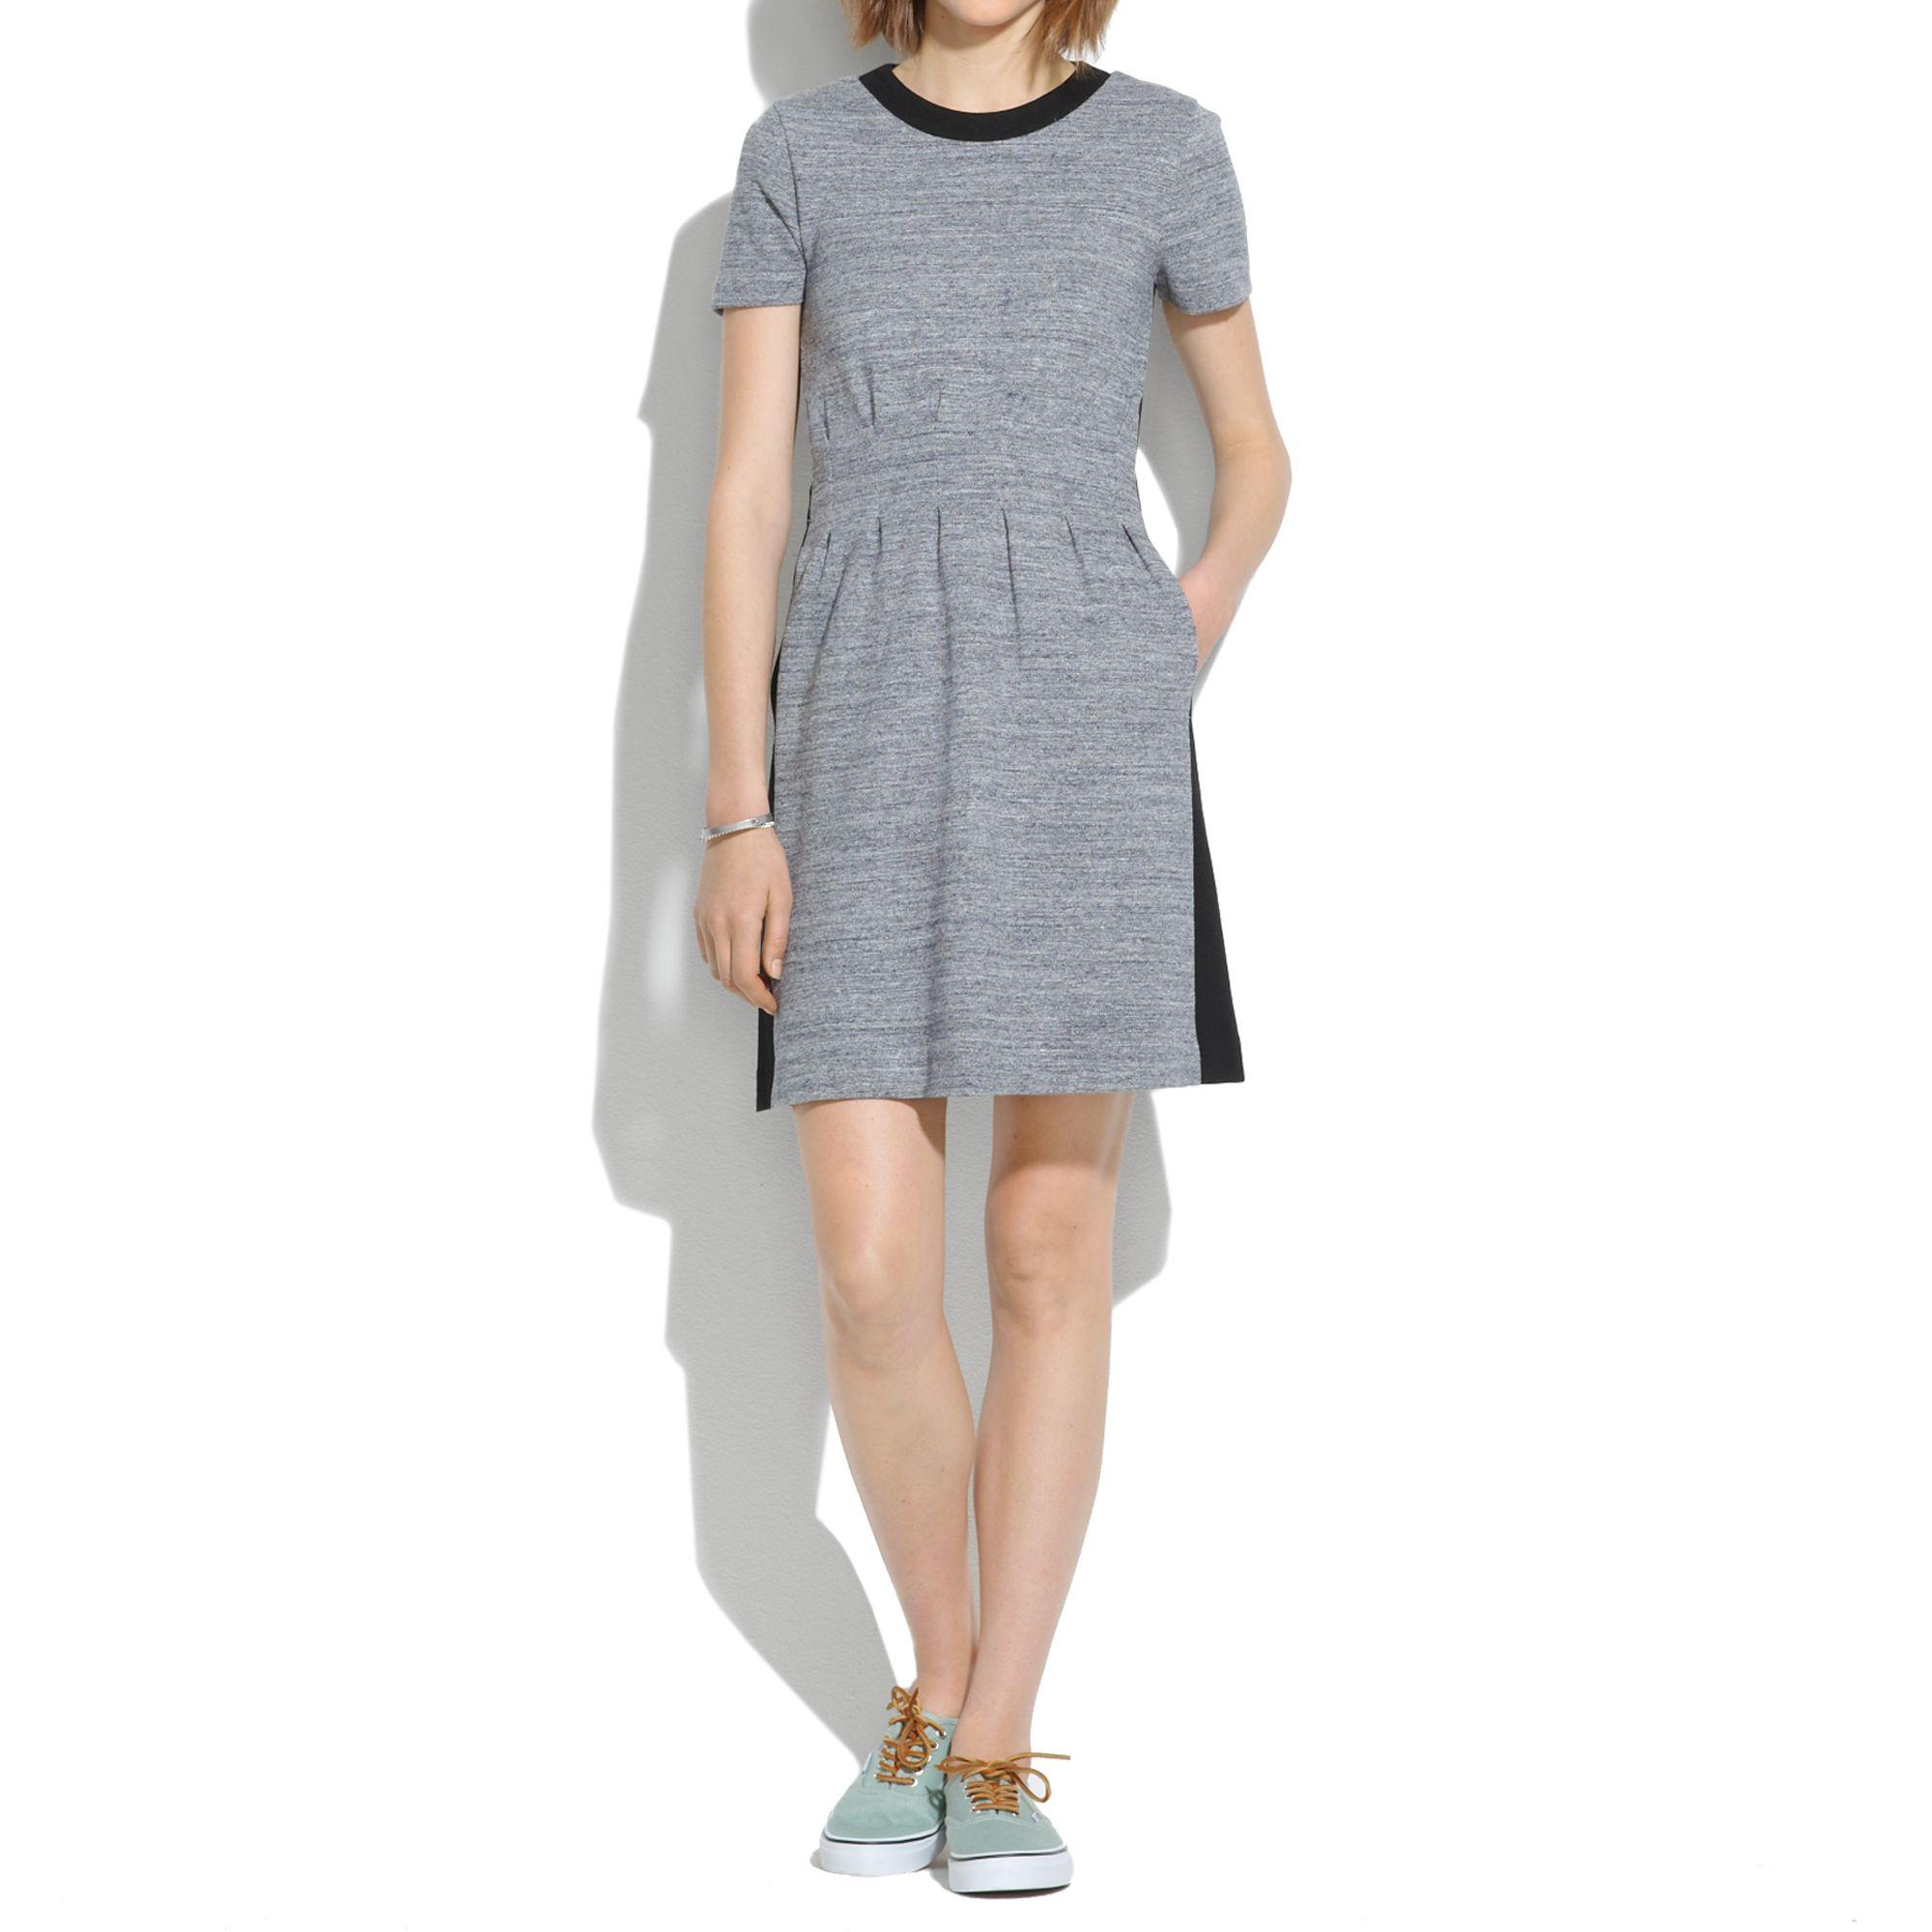 49114dbd67b Lyst - Madewell Parkline Dress in Colorblock in Gray